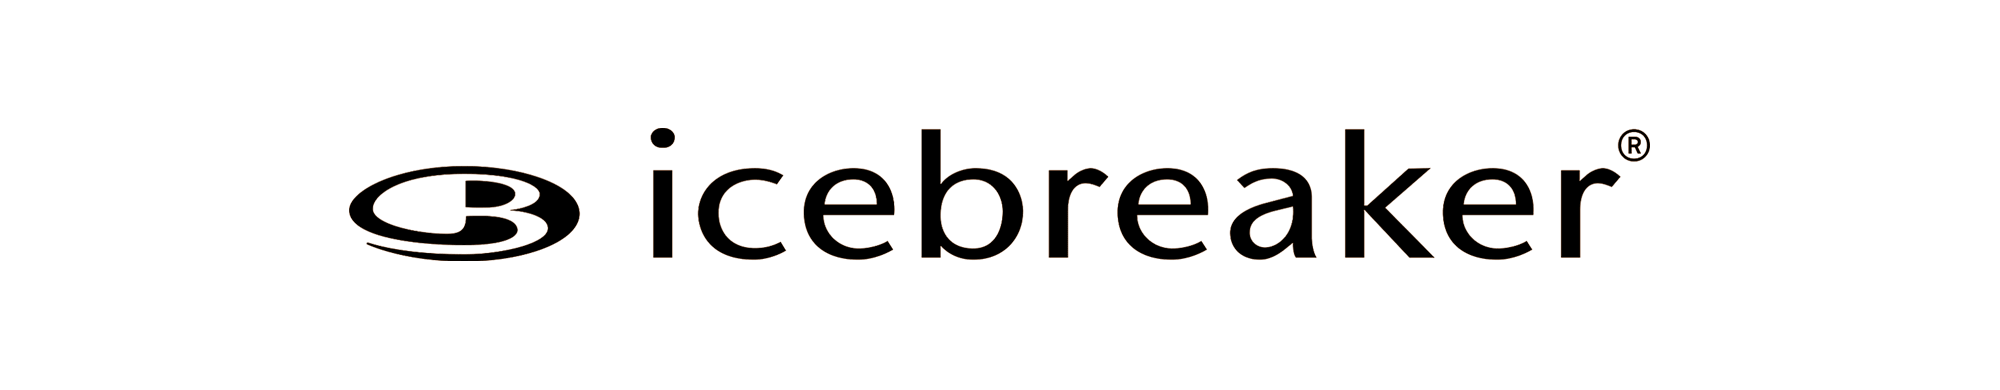 icebreaker copy.png